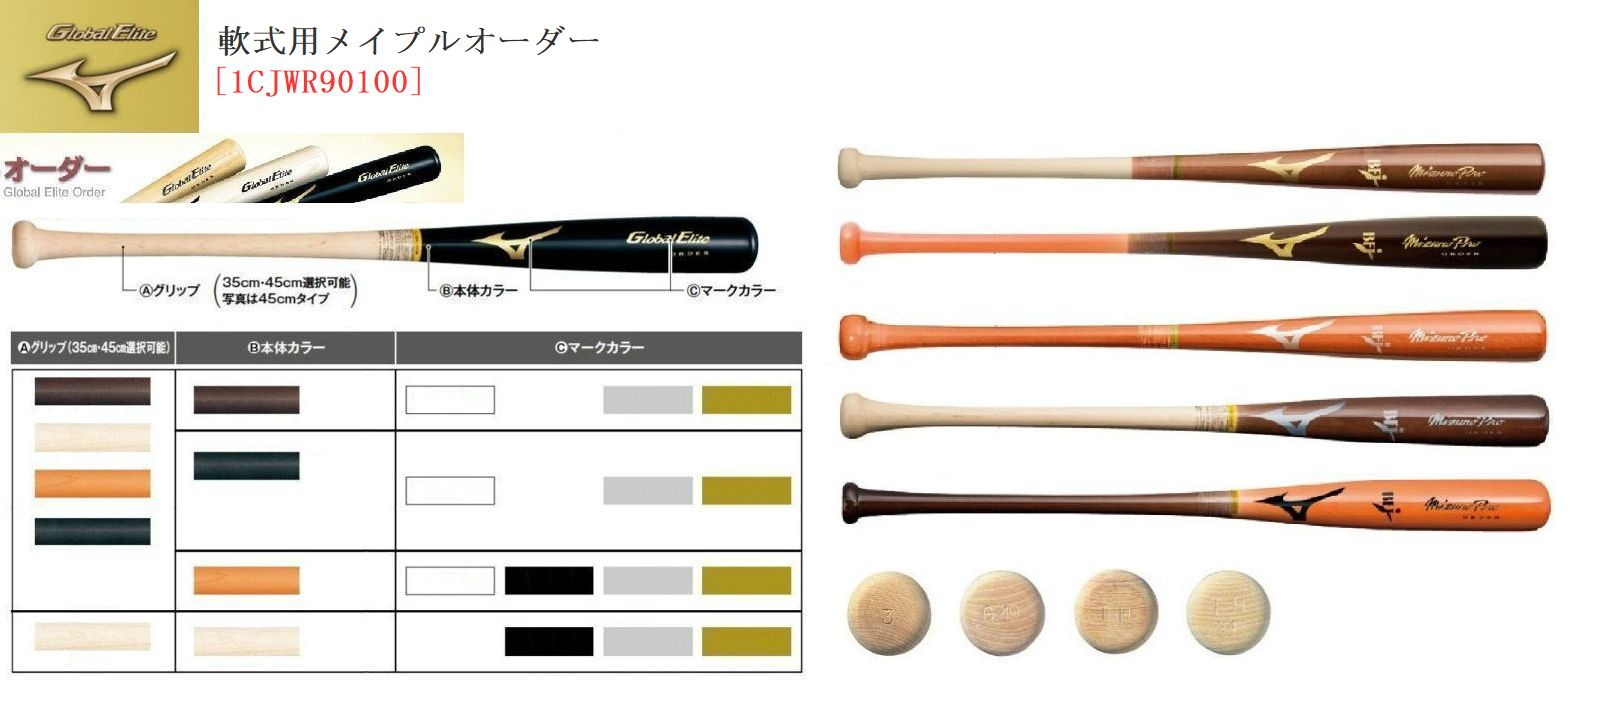 【Mizuno Global Elite=ミズノ・グローバルエリート】野球 バットオーダー オーダー野球バット 木製バットオーダーミズノ オーダーバット軟式バットオーダー野球軟式用木製バットオーダーメイプルオーダー